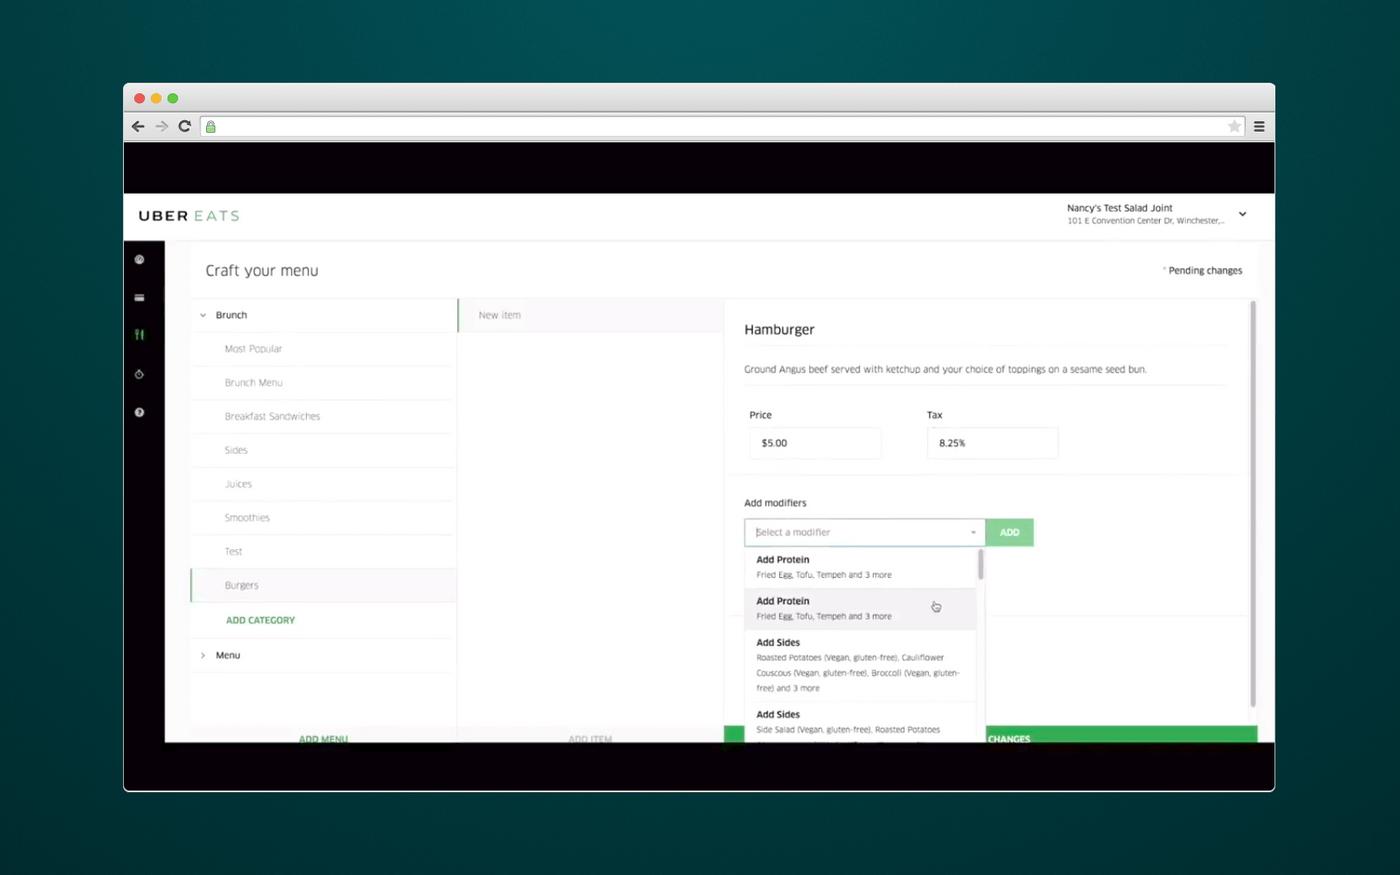 How eateries add menu via UberEats admin panel